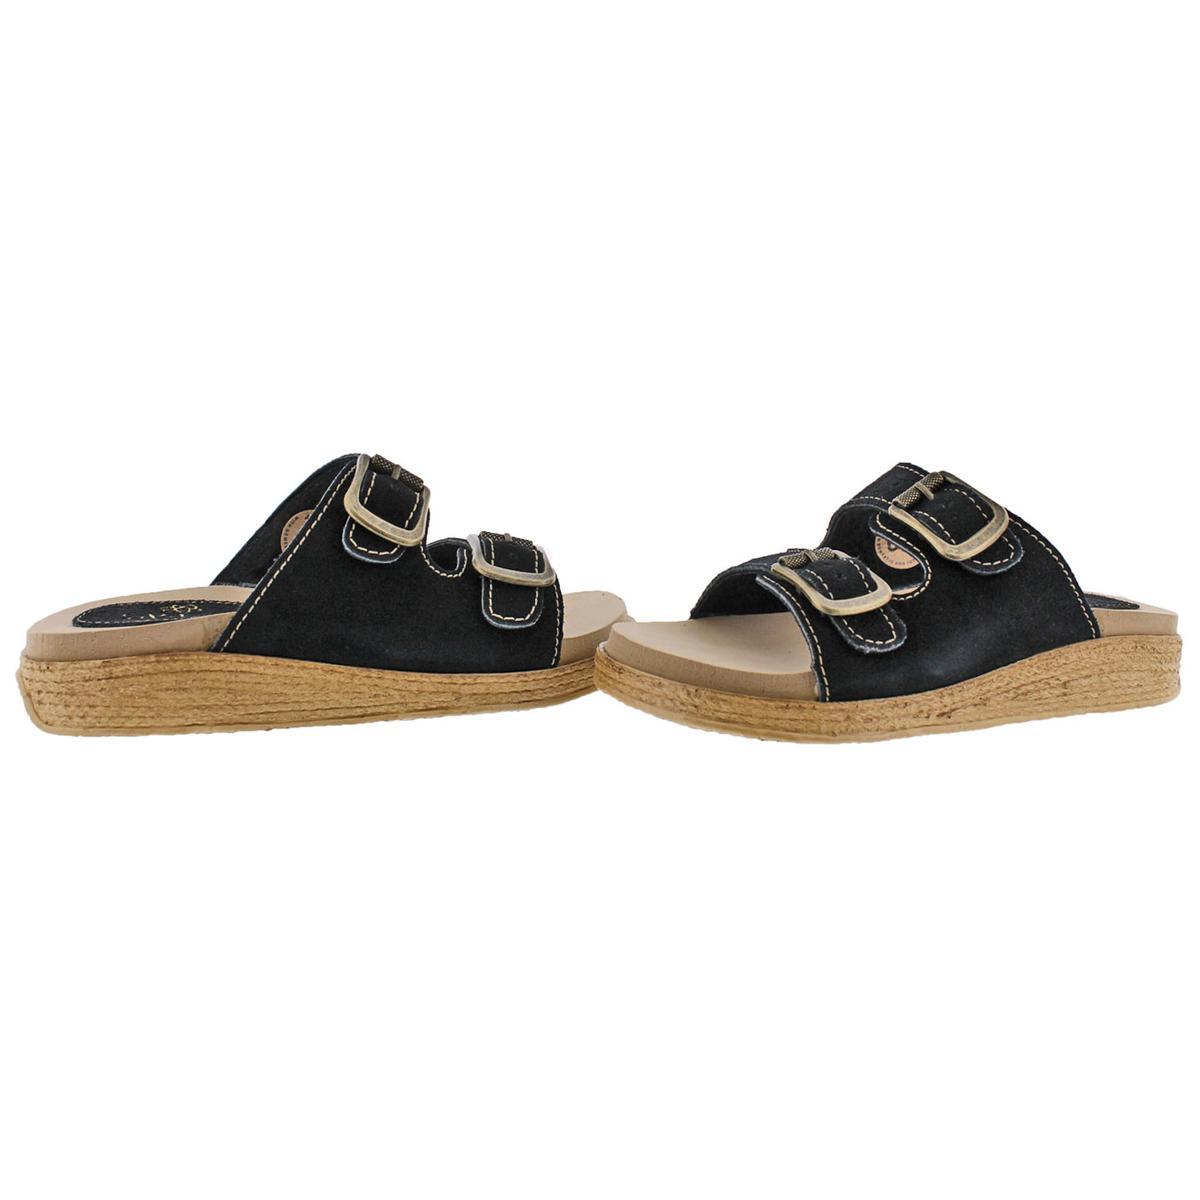 Sbicca-Espadrille-Buckle-Women-039-s-Buckle-Slide-Sandals thumbnail 5